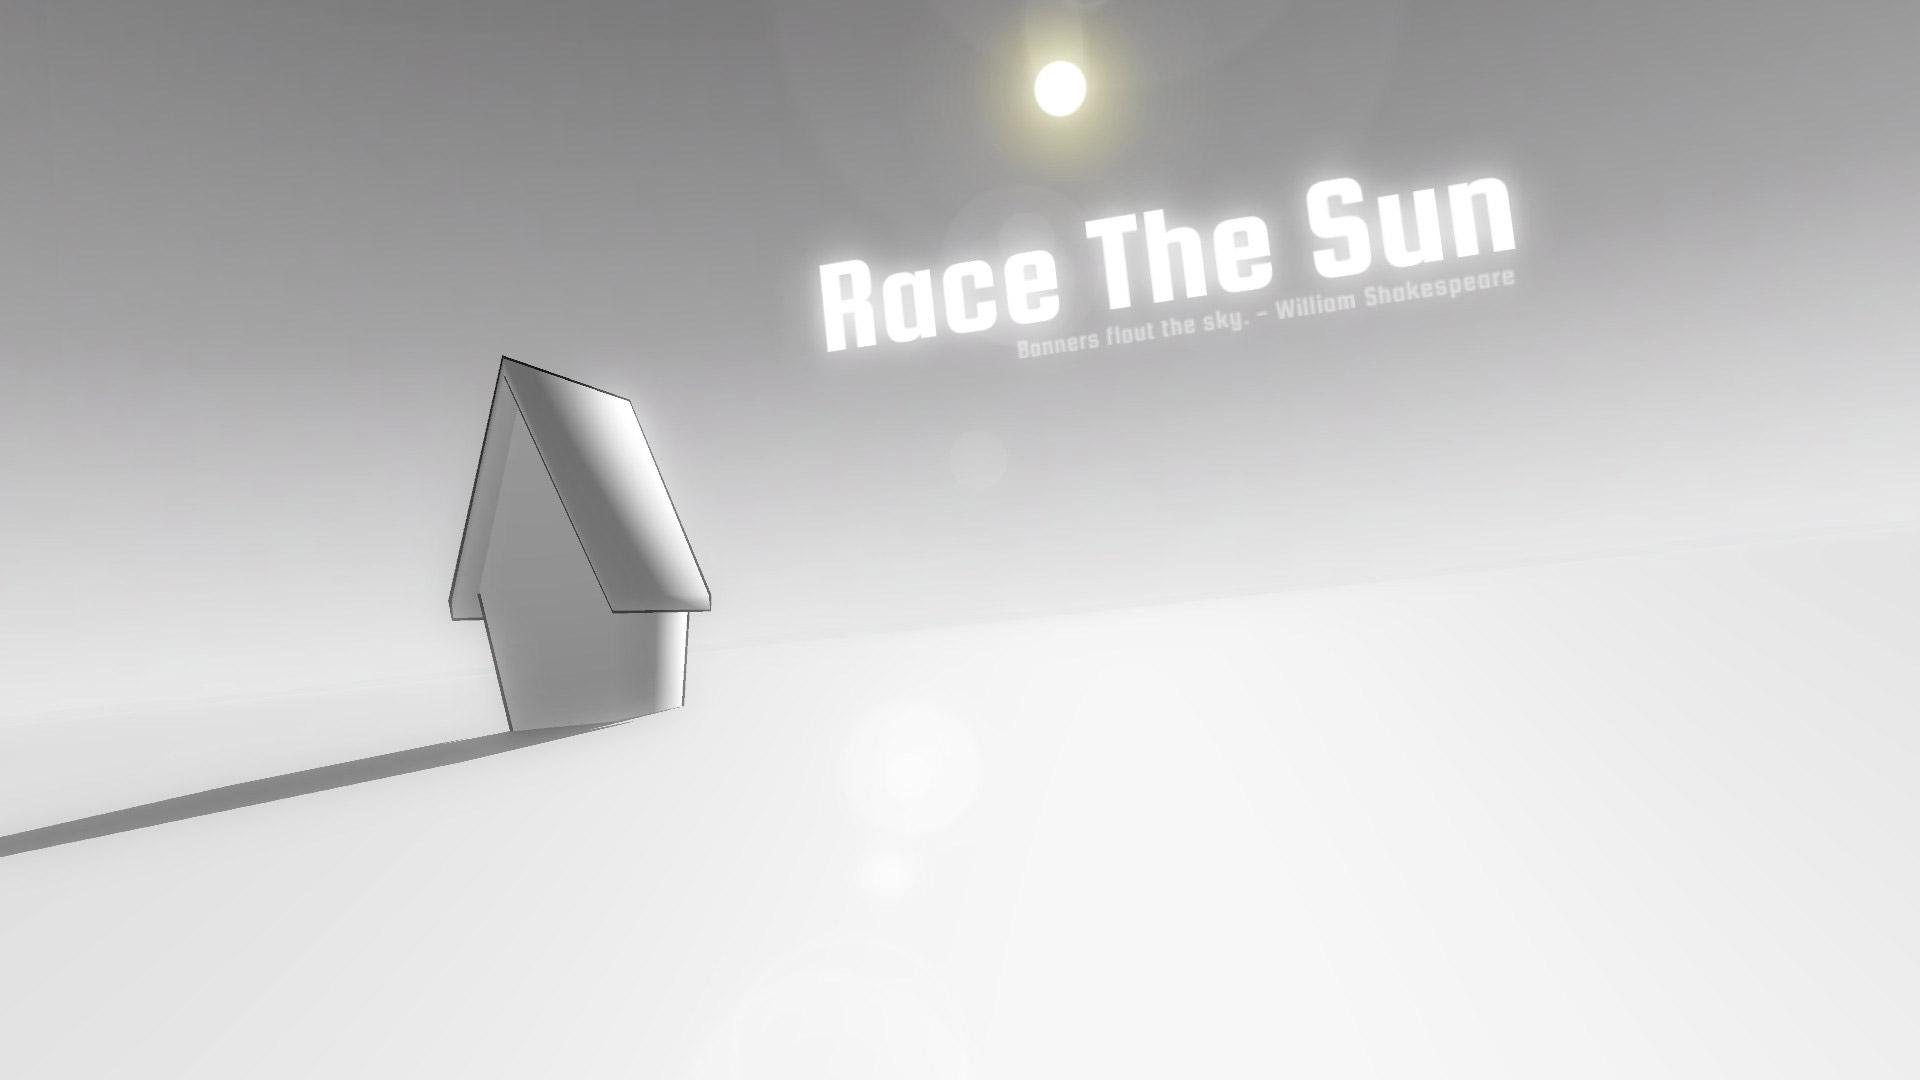 Free Race the Sun Wallpaper in 1920x1080